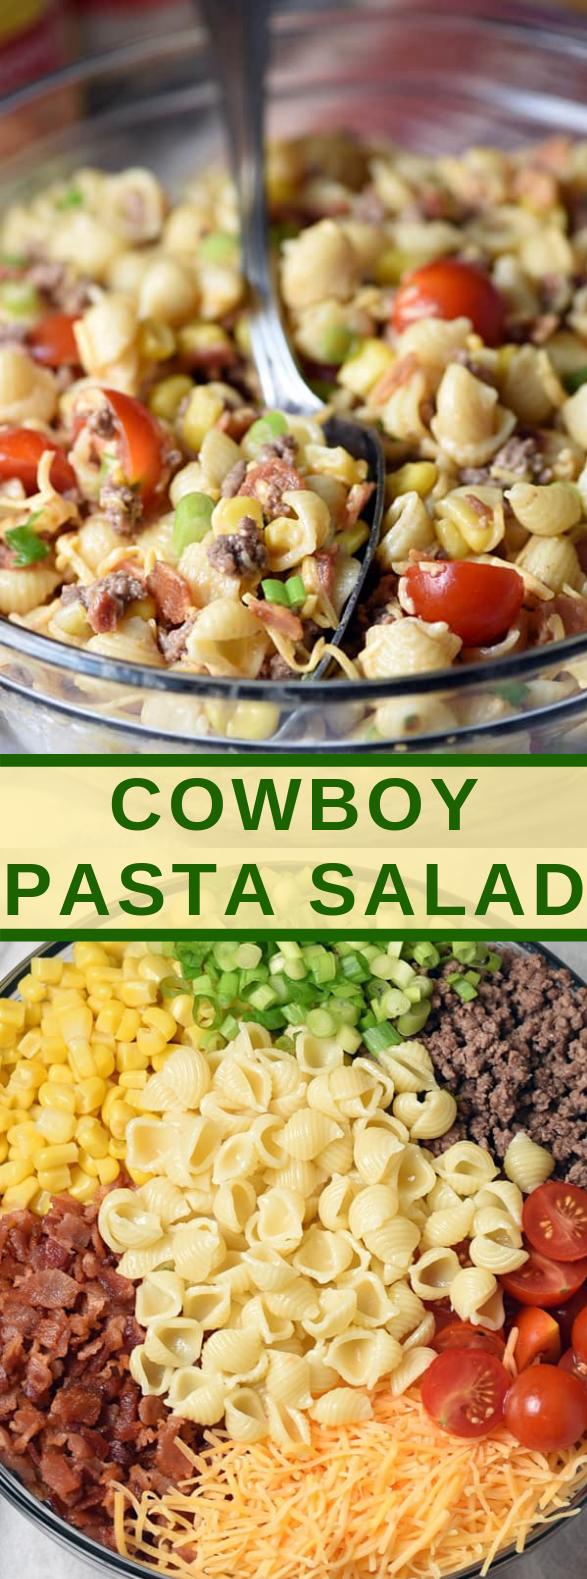 COWBOY PASTA SALAD #vegetarian #easysalads